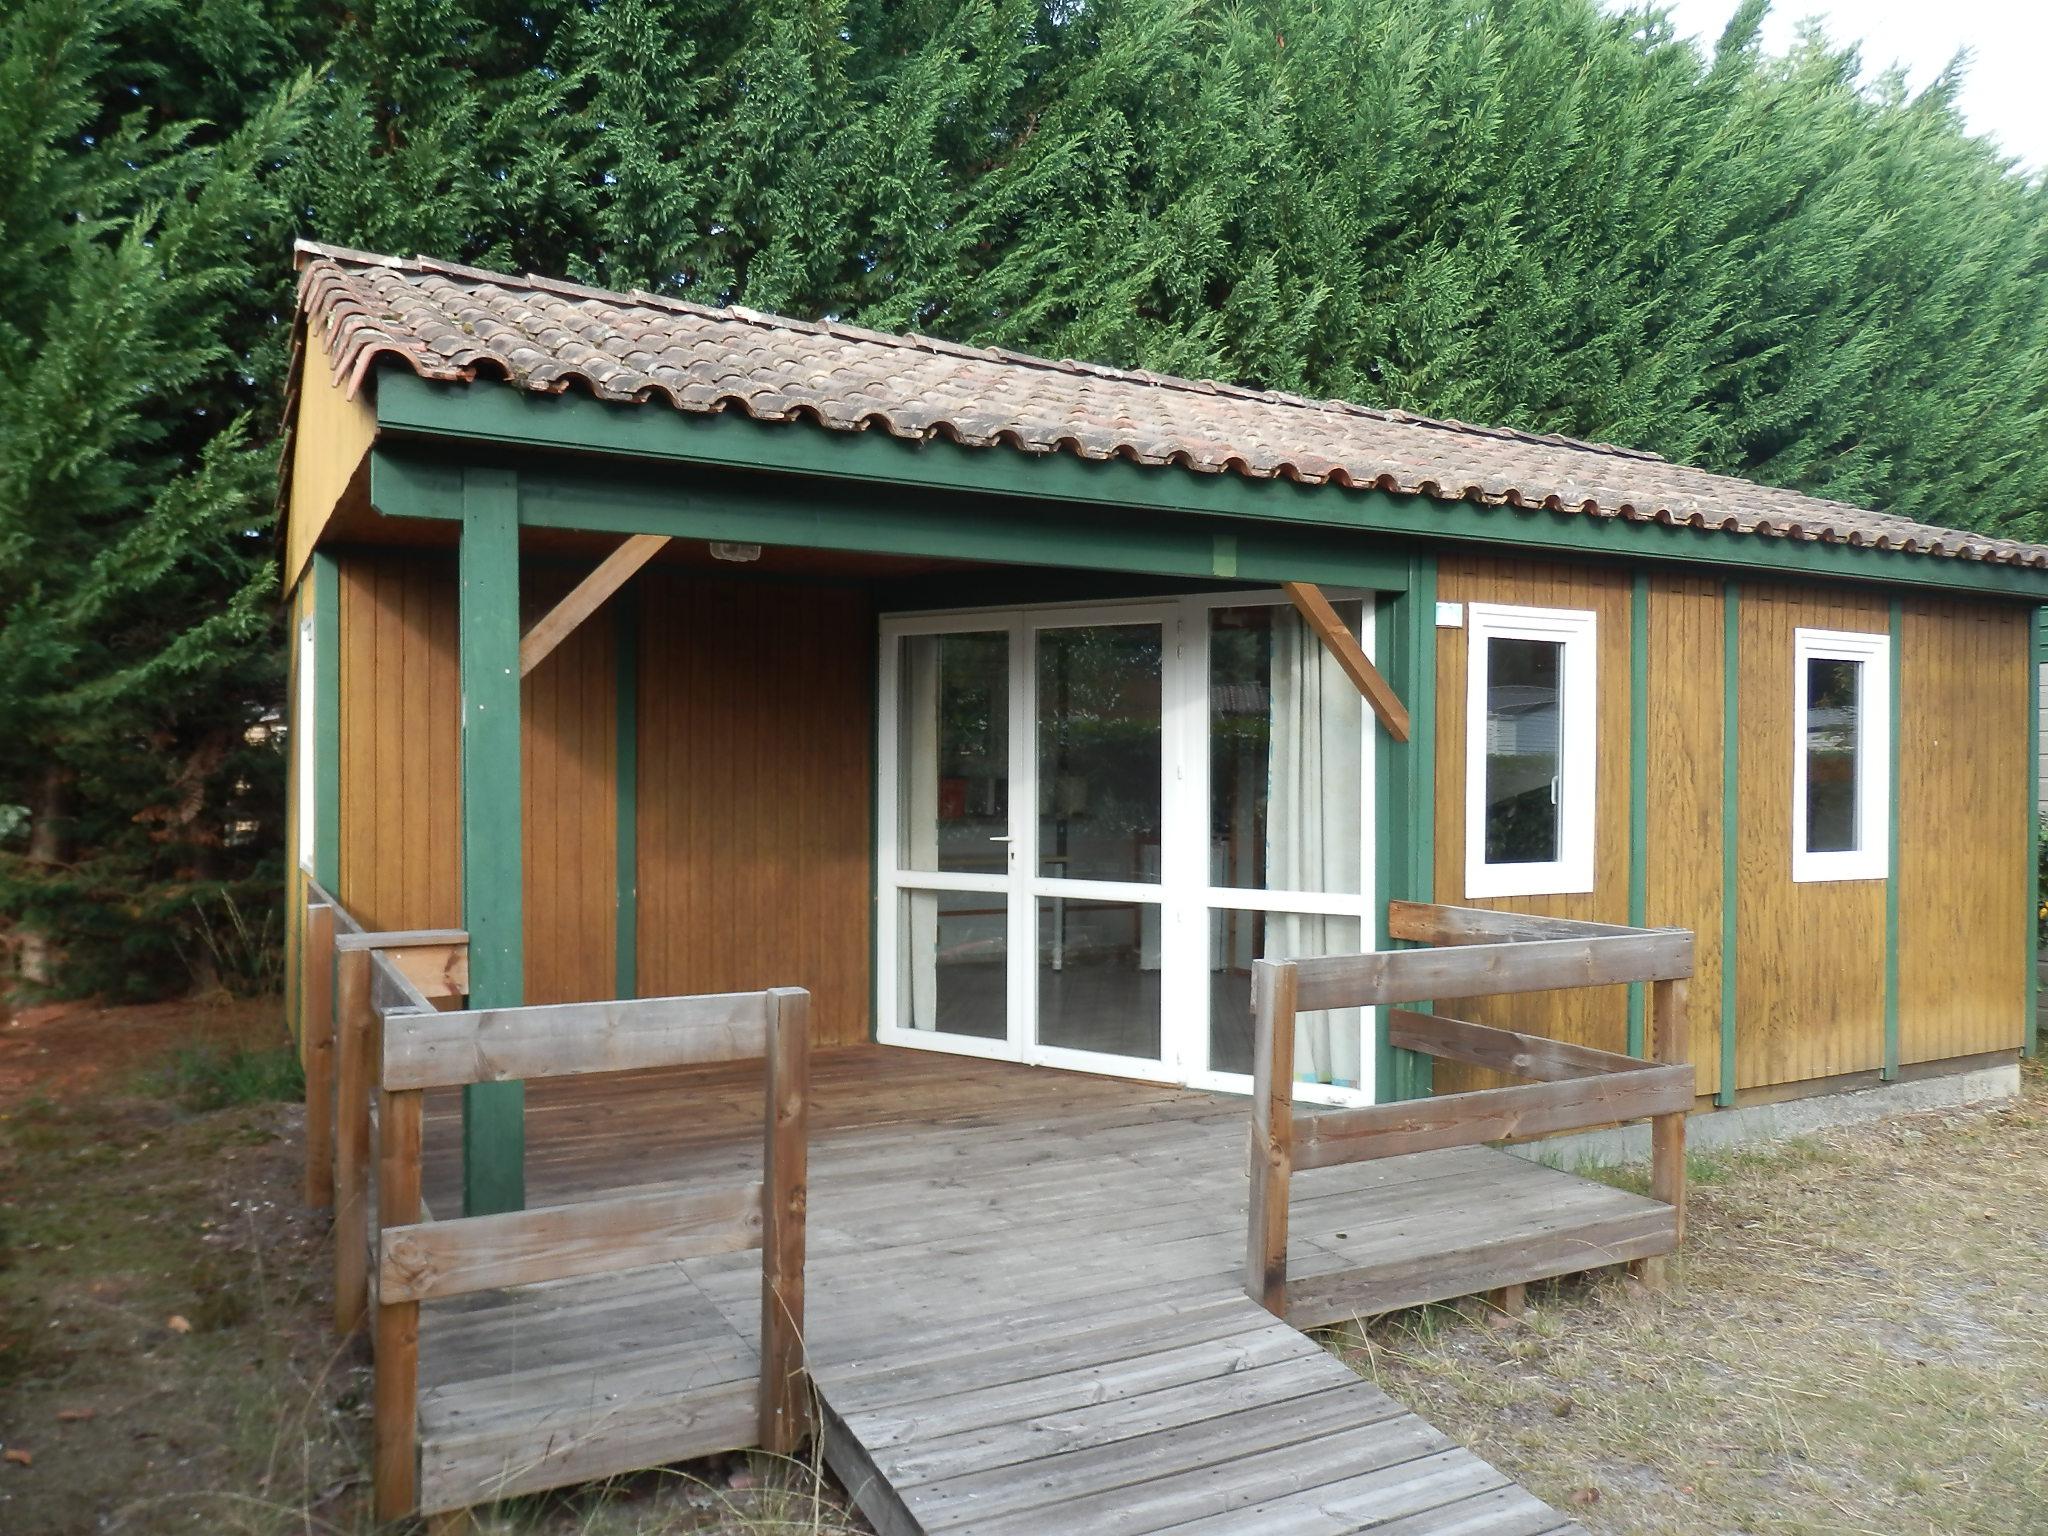 Casa prefabricada barata c diz mitad de madera mitad de - Casas de madera cadiz ...